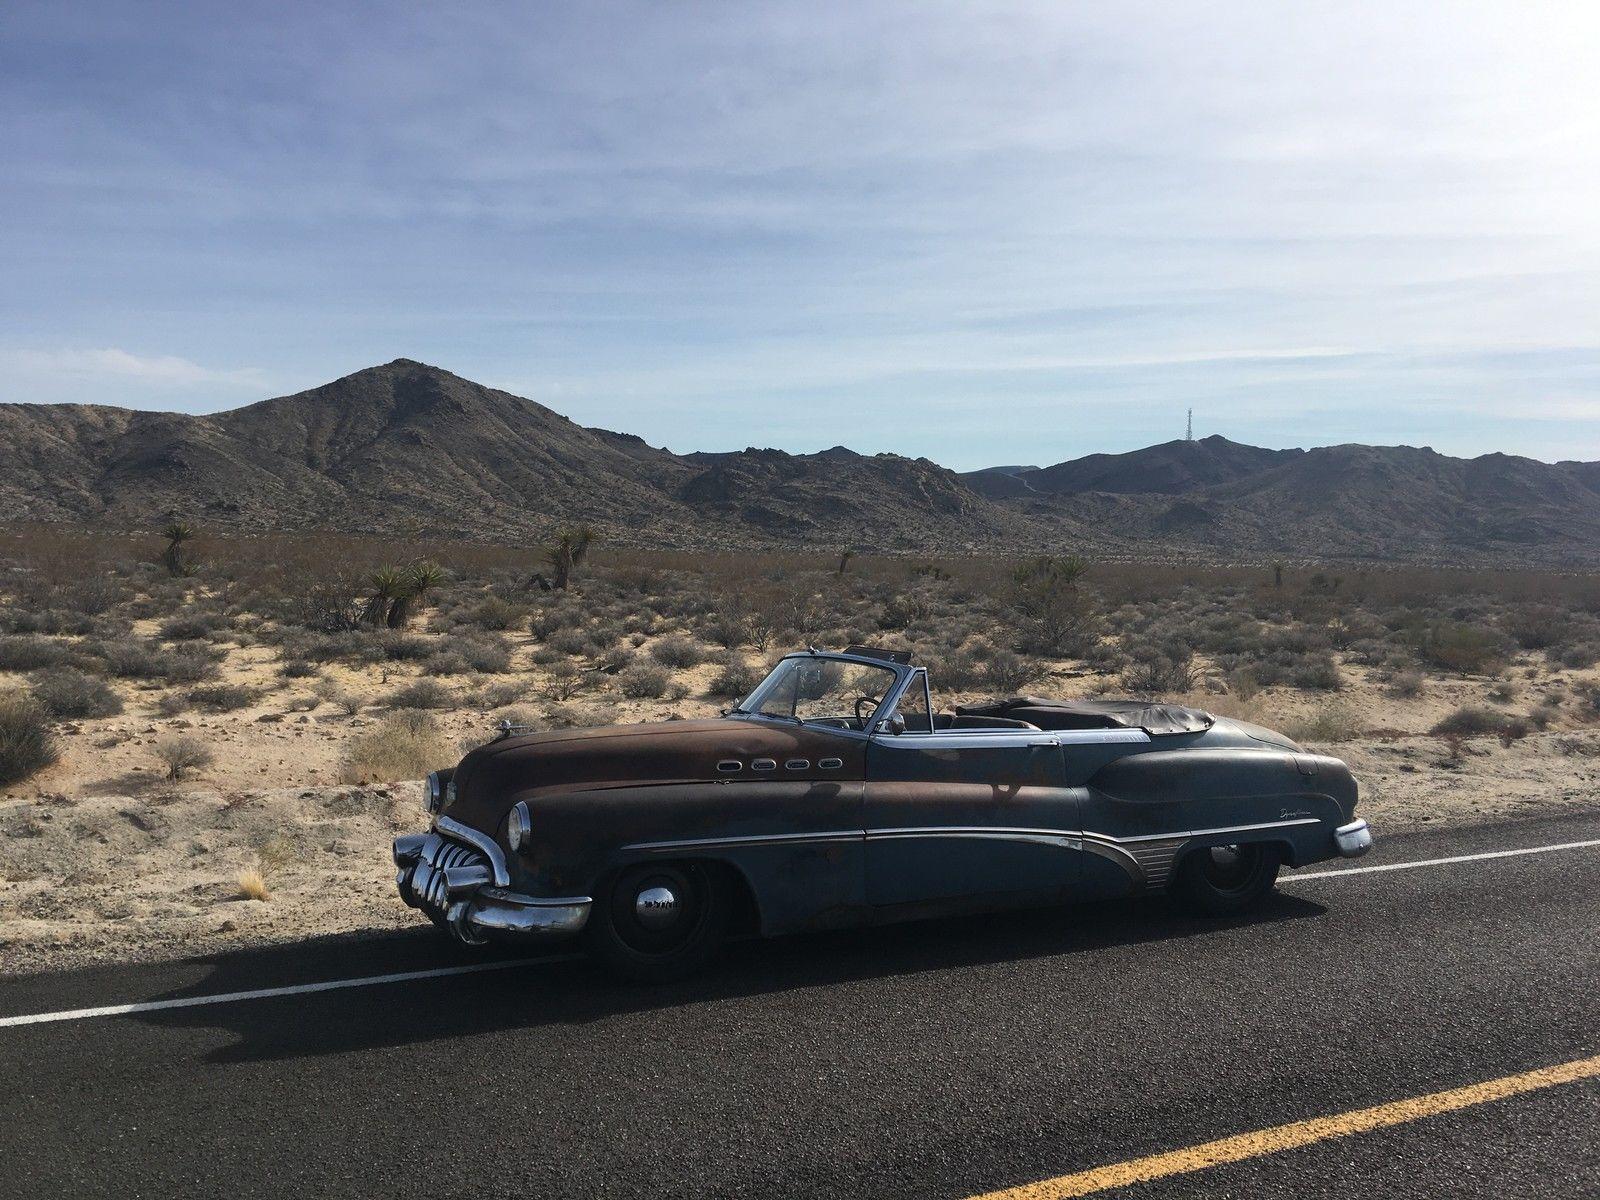 1950 Buick Roadmaster ICON Derelict 3/4 desert mountains